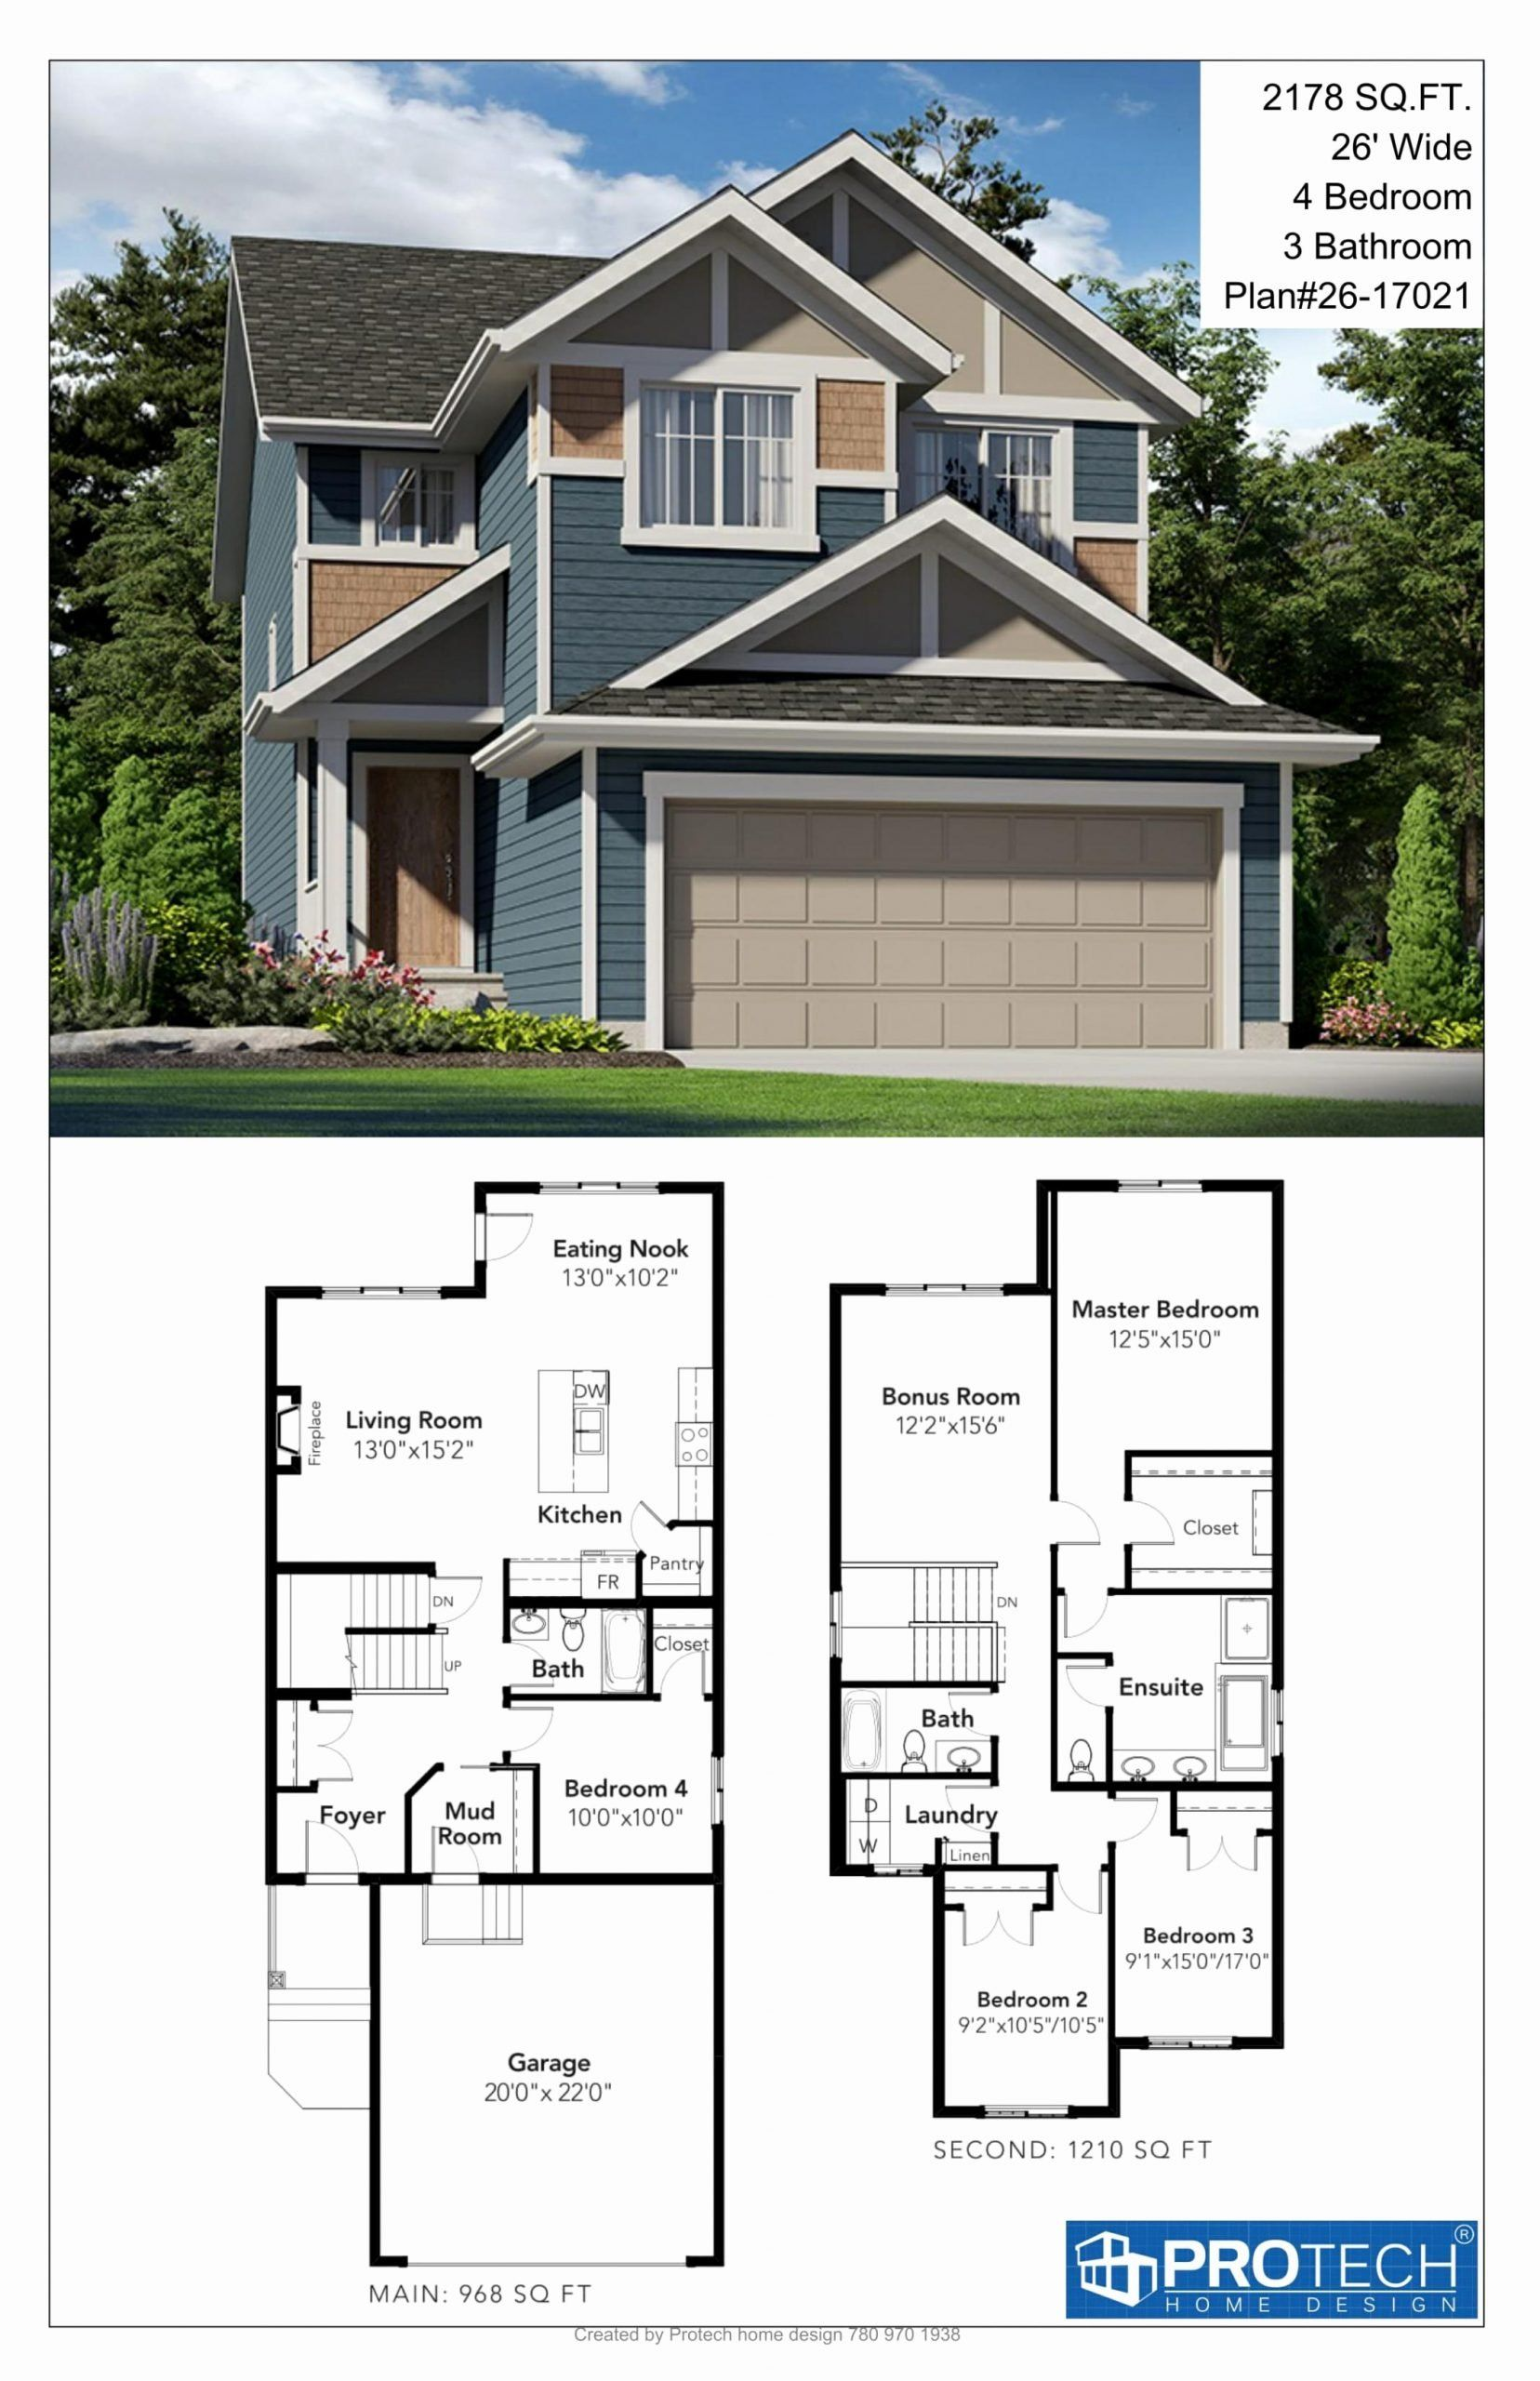 2 Story Home Design Plans Inspirational Stock Plans Home Design Plans Stock Plans House Plans